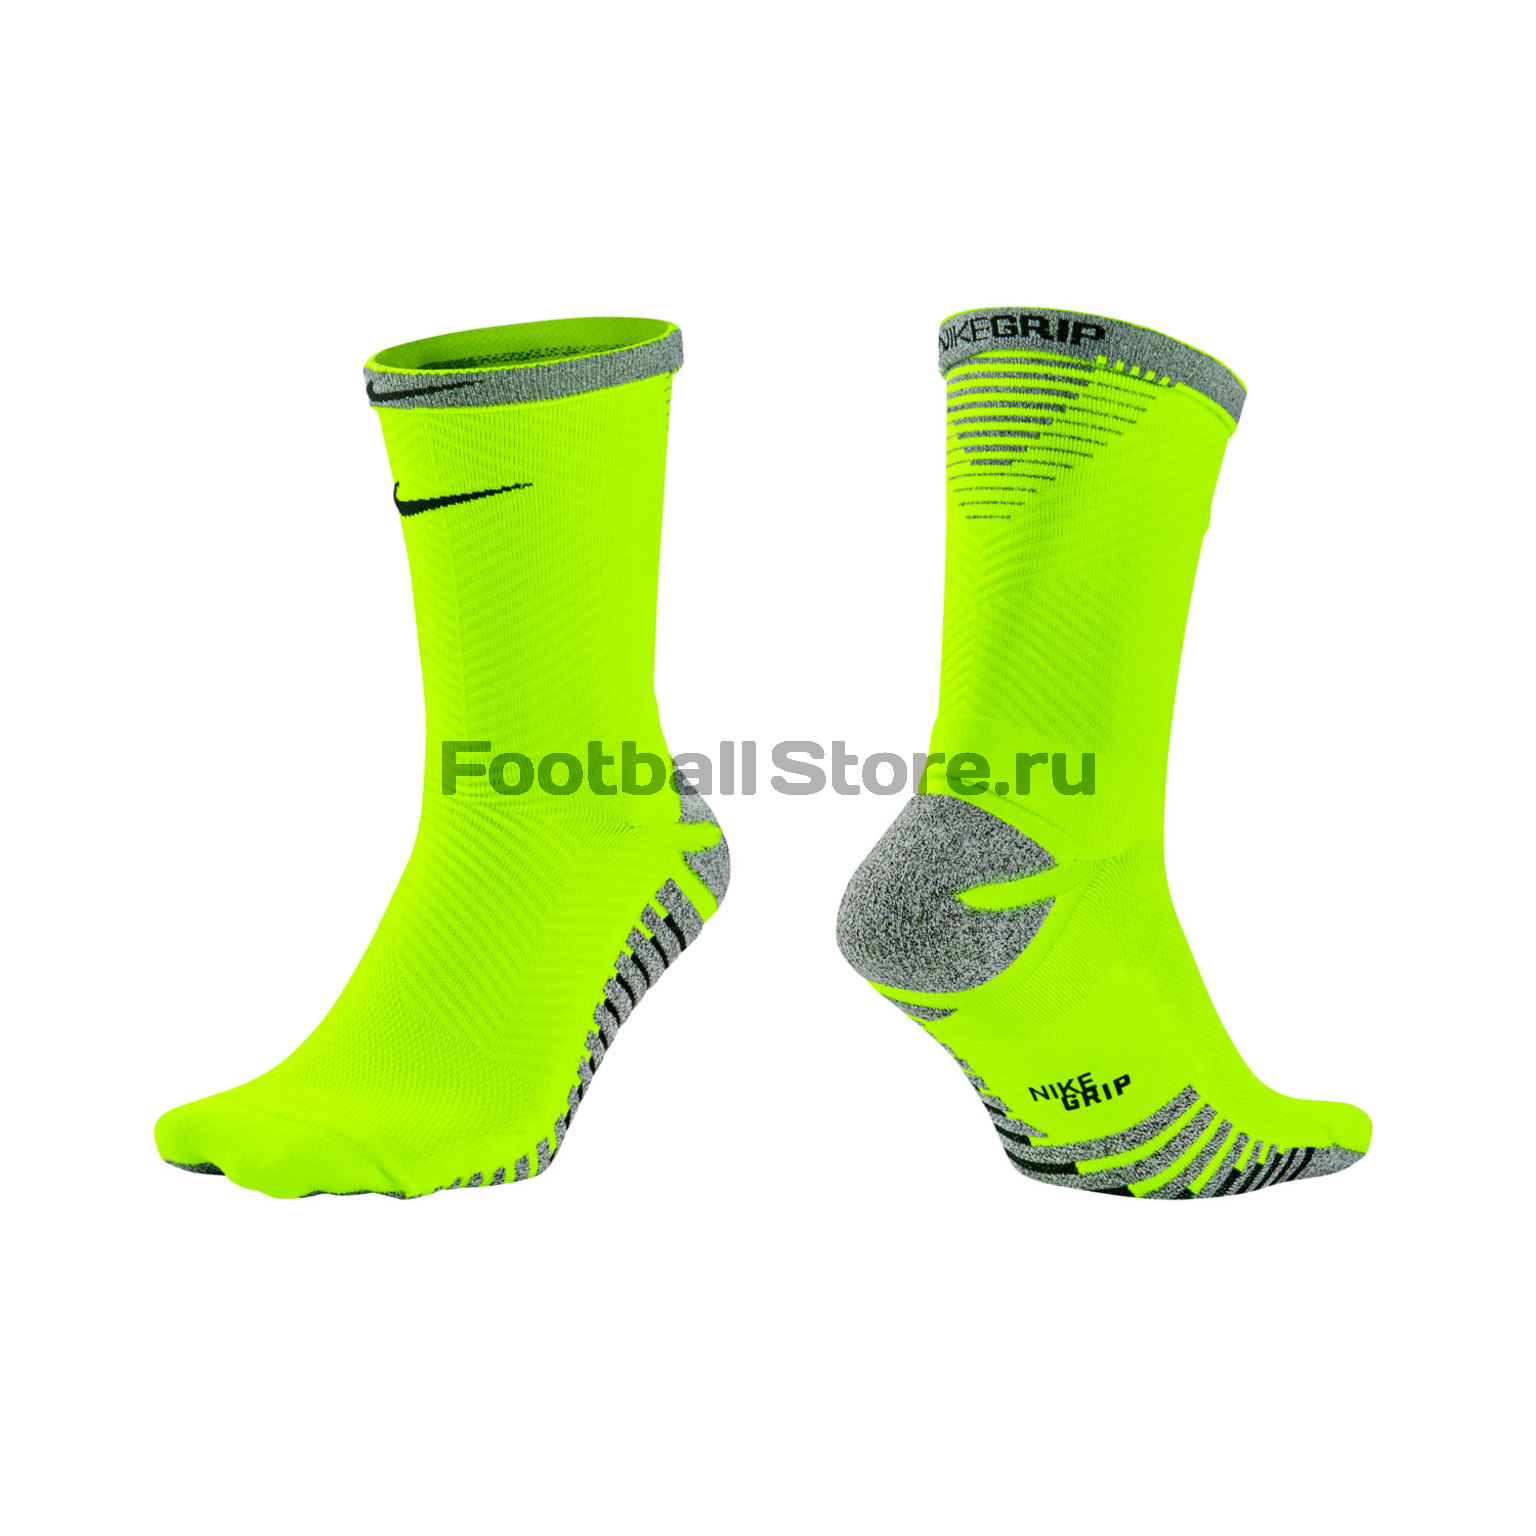 Носки Nike Носки Nike Grip Strike Light Crew SX5486-702 носки nike носки nike grip strike lightweight sx5089 525